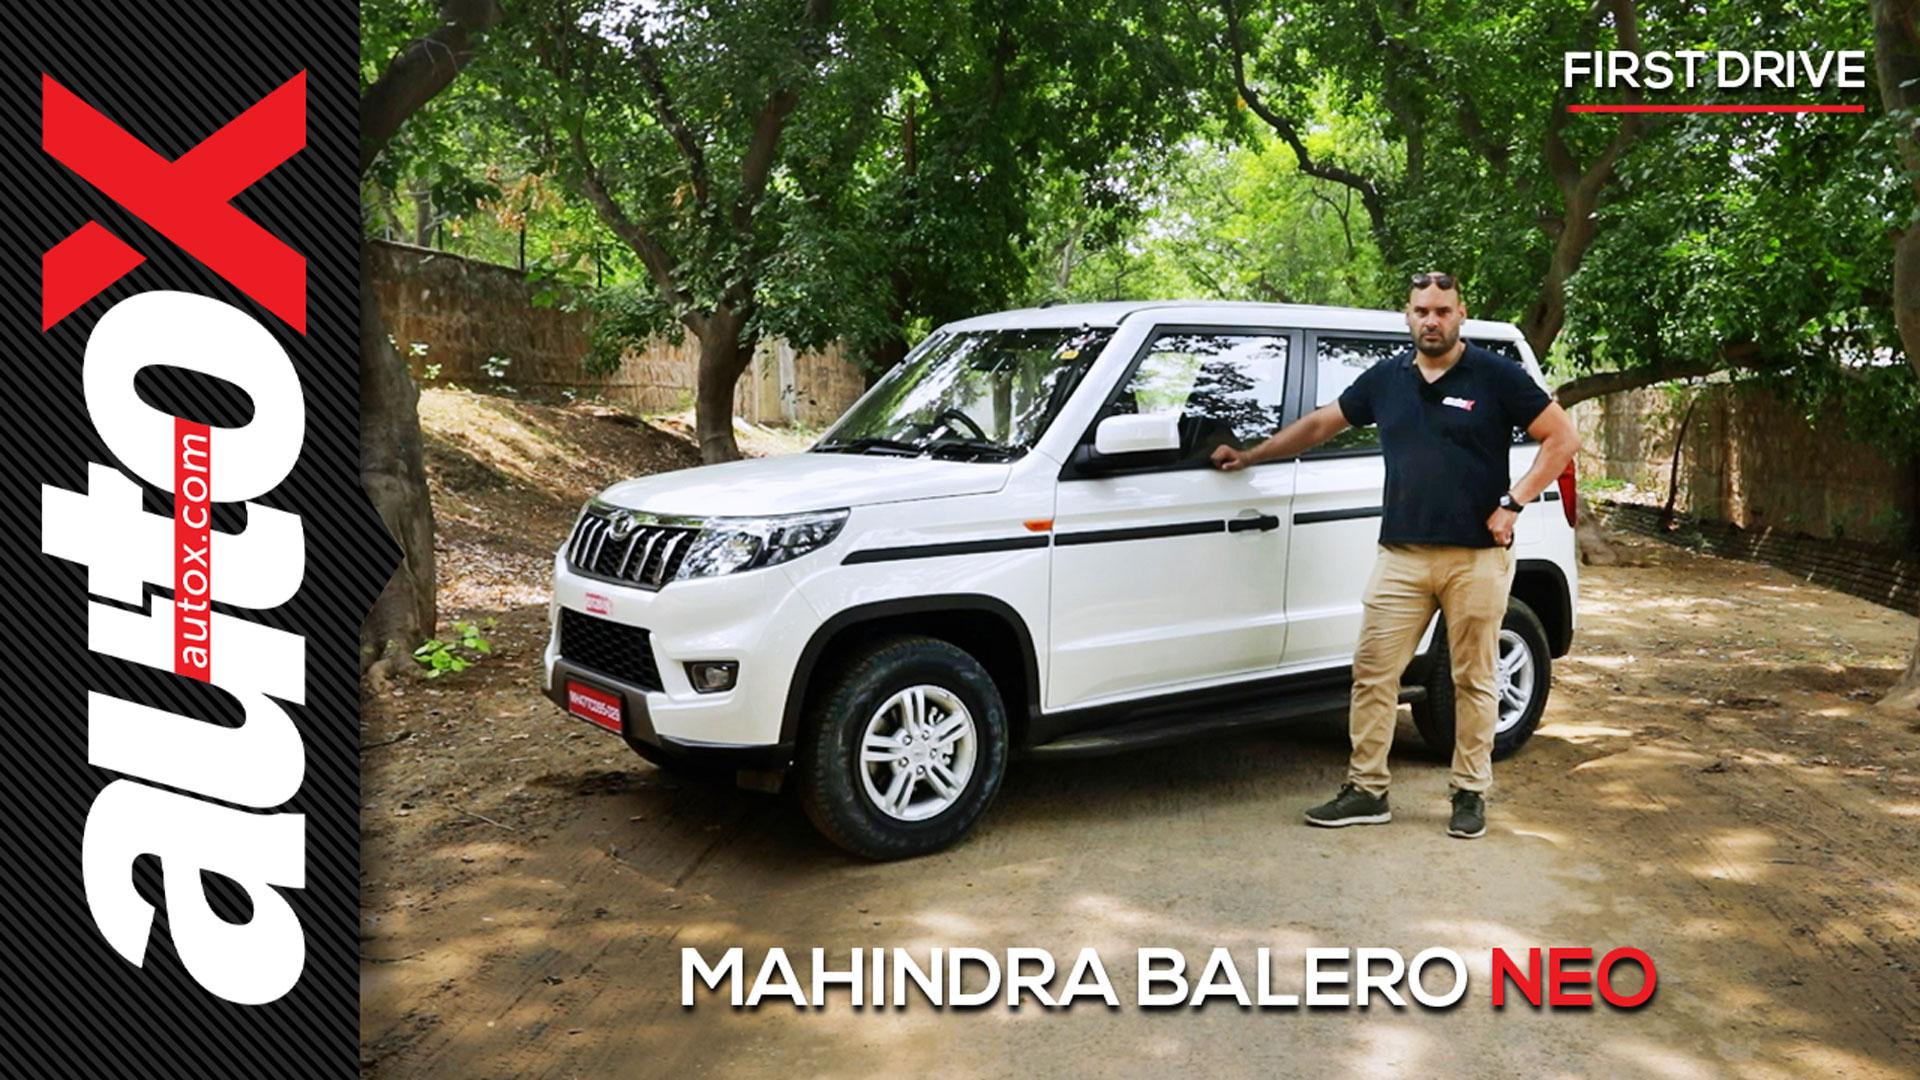 Mahindra Bolero Neo Review: Compact Adventure SUV | First Drive | autoX